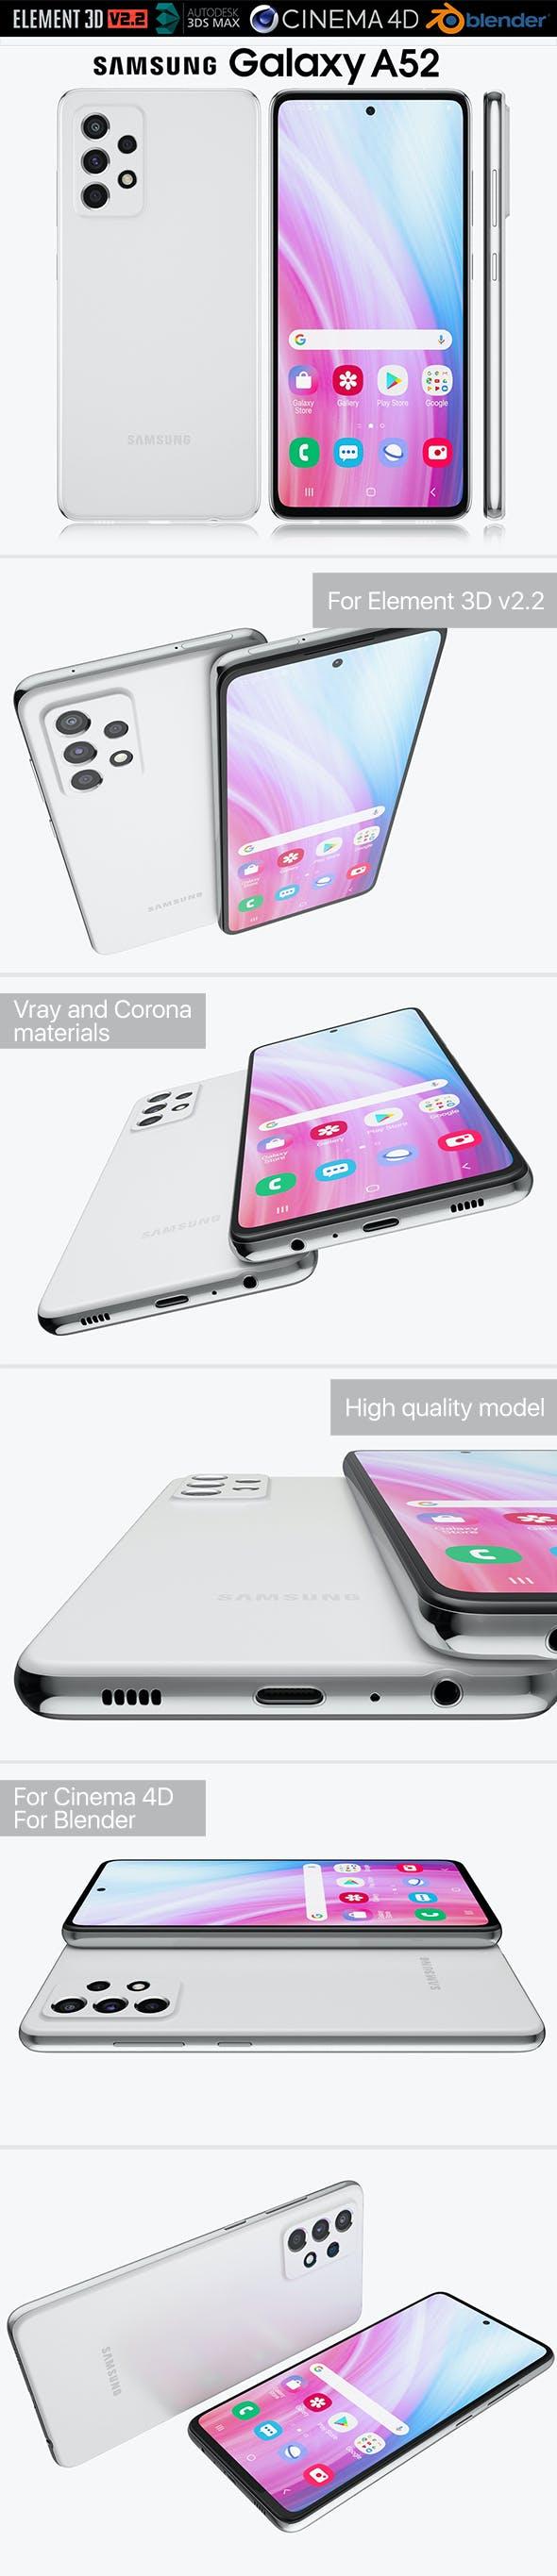 Samsung Galaxy A52 - 3DOcean Item for Sale